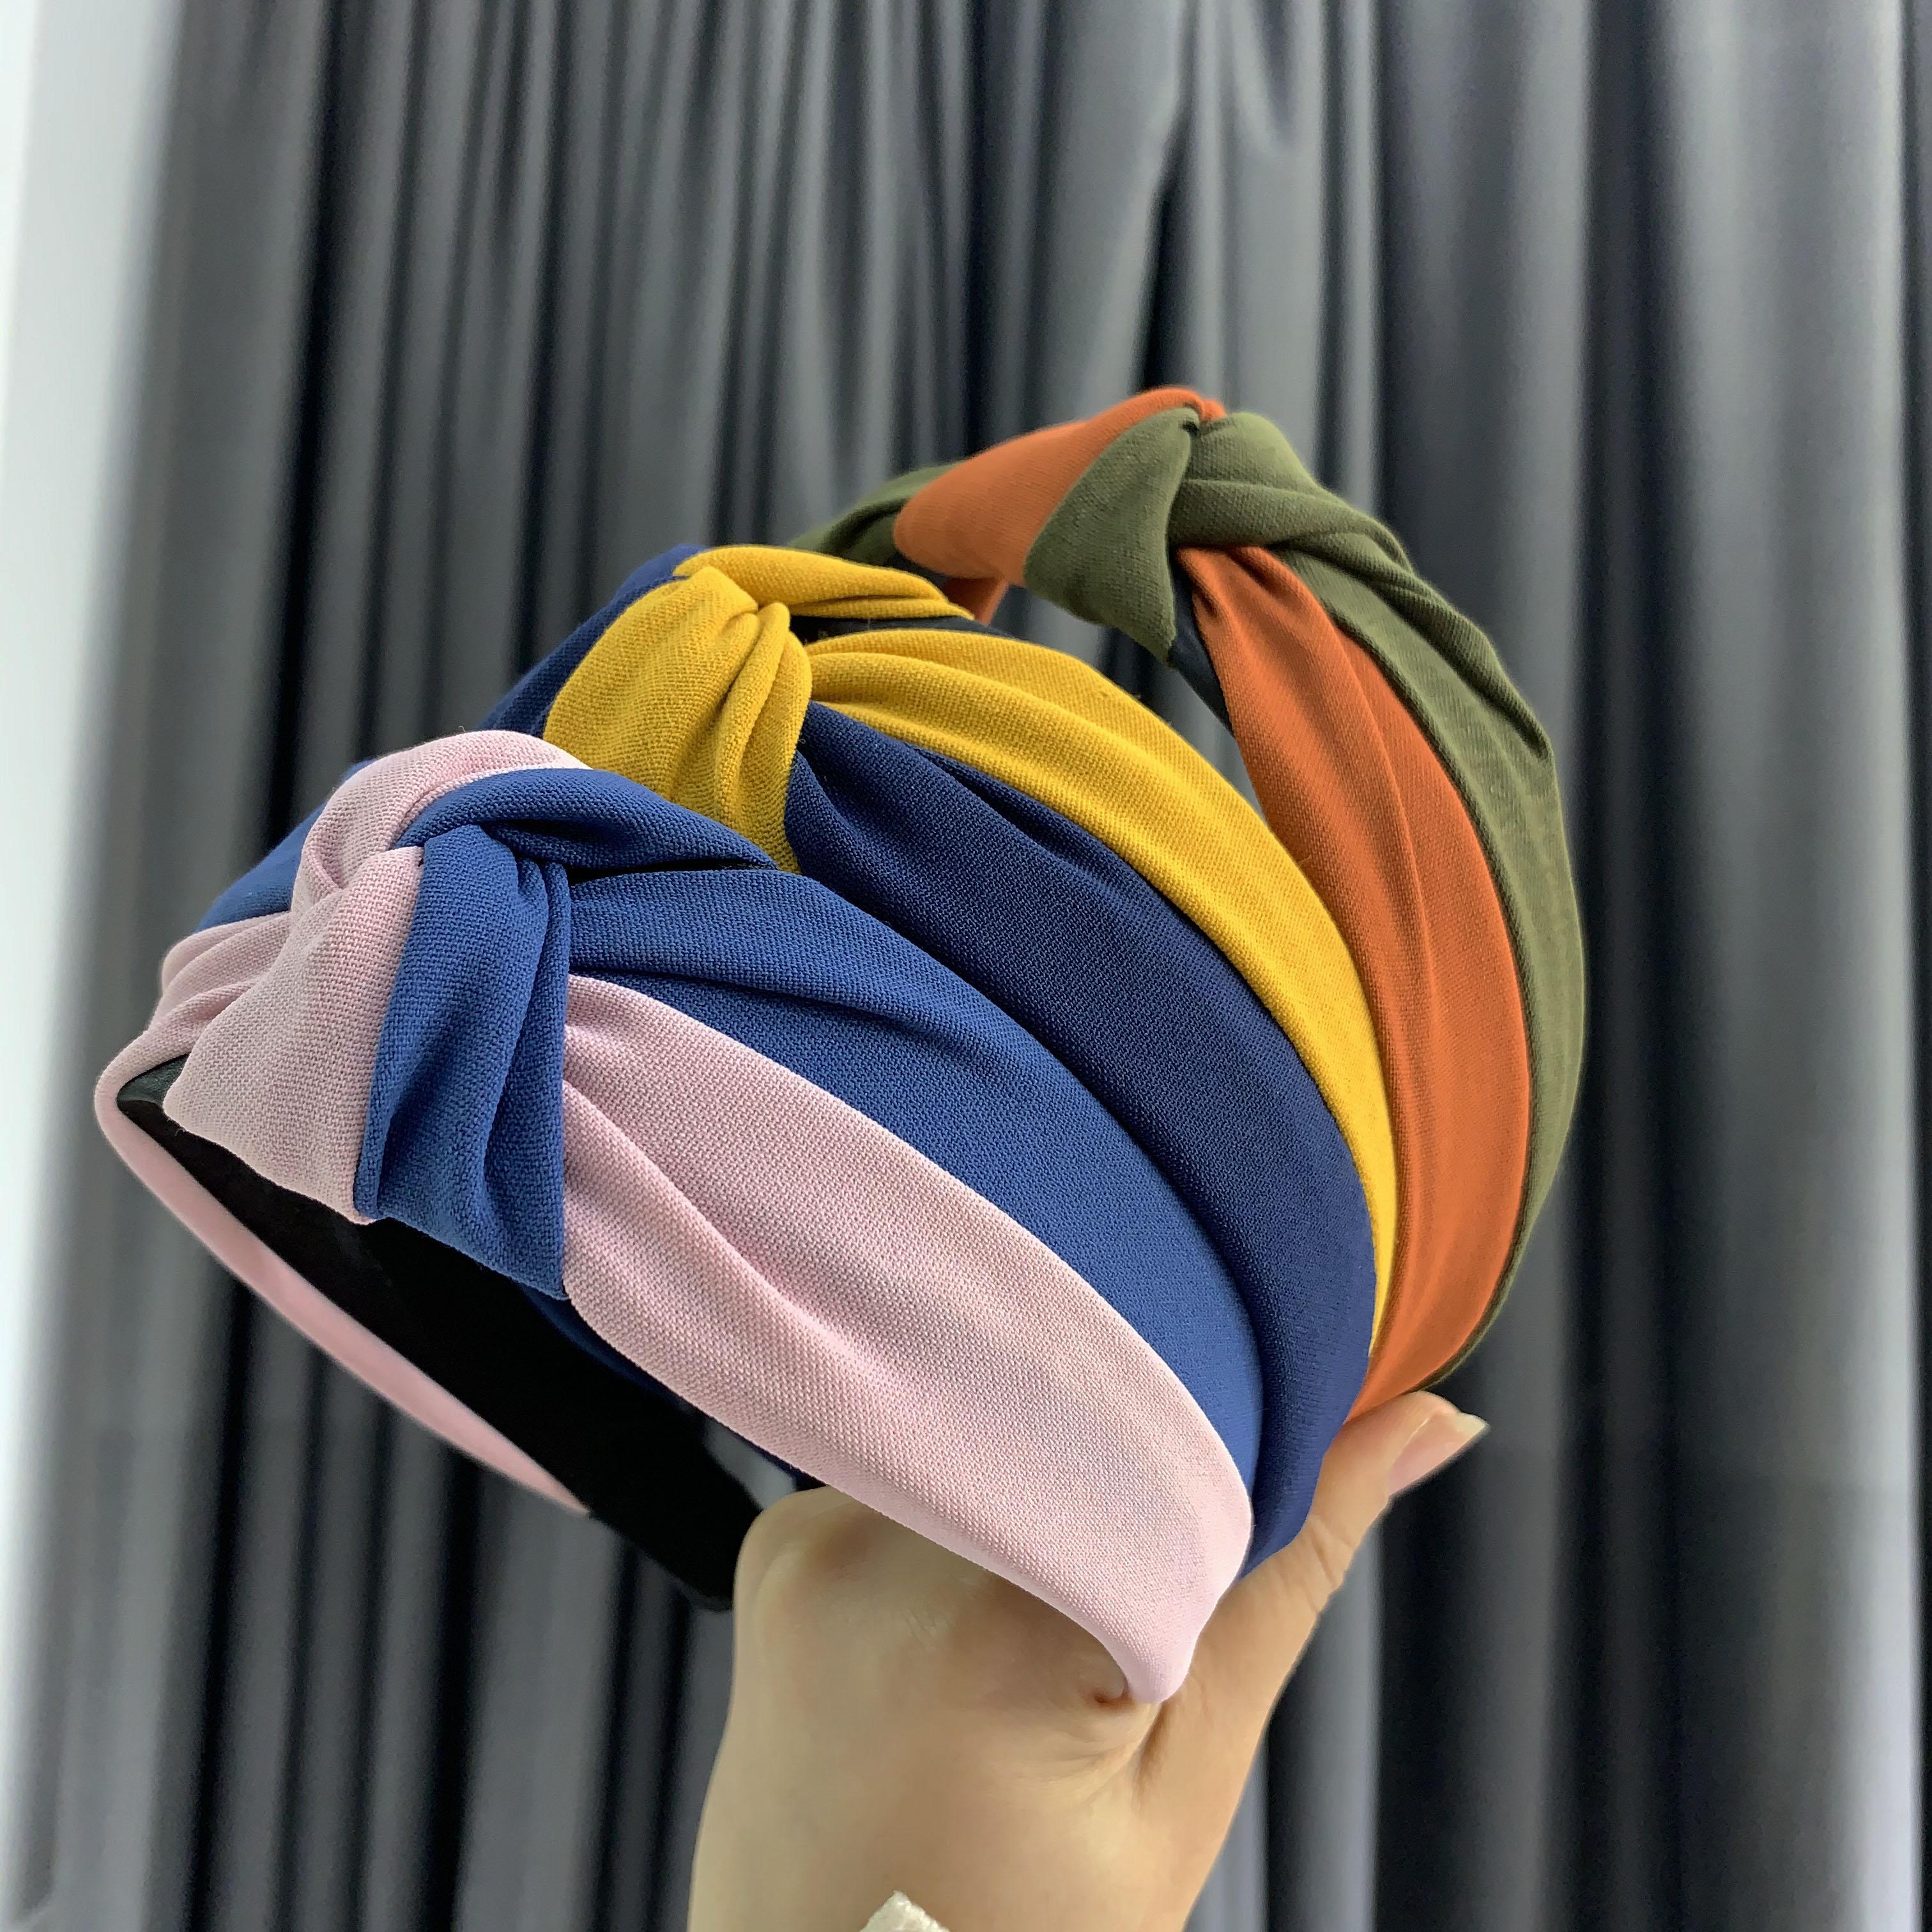 CHENYAN Fashion Ladies Headband Girl Sweet Hairband Women Patchwork Headbands XLFG1915